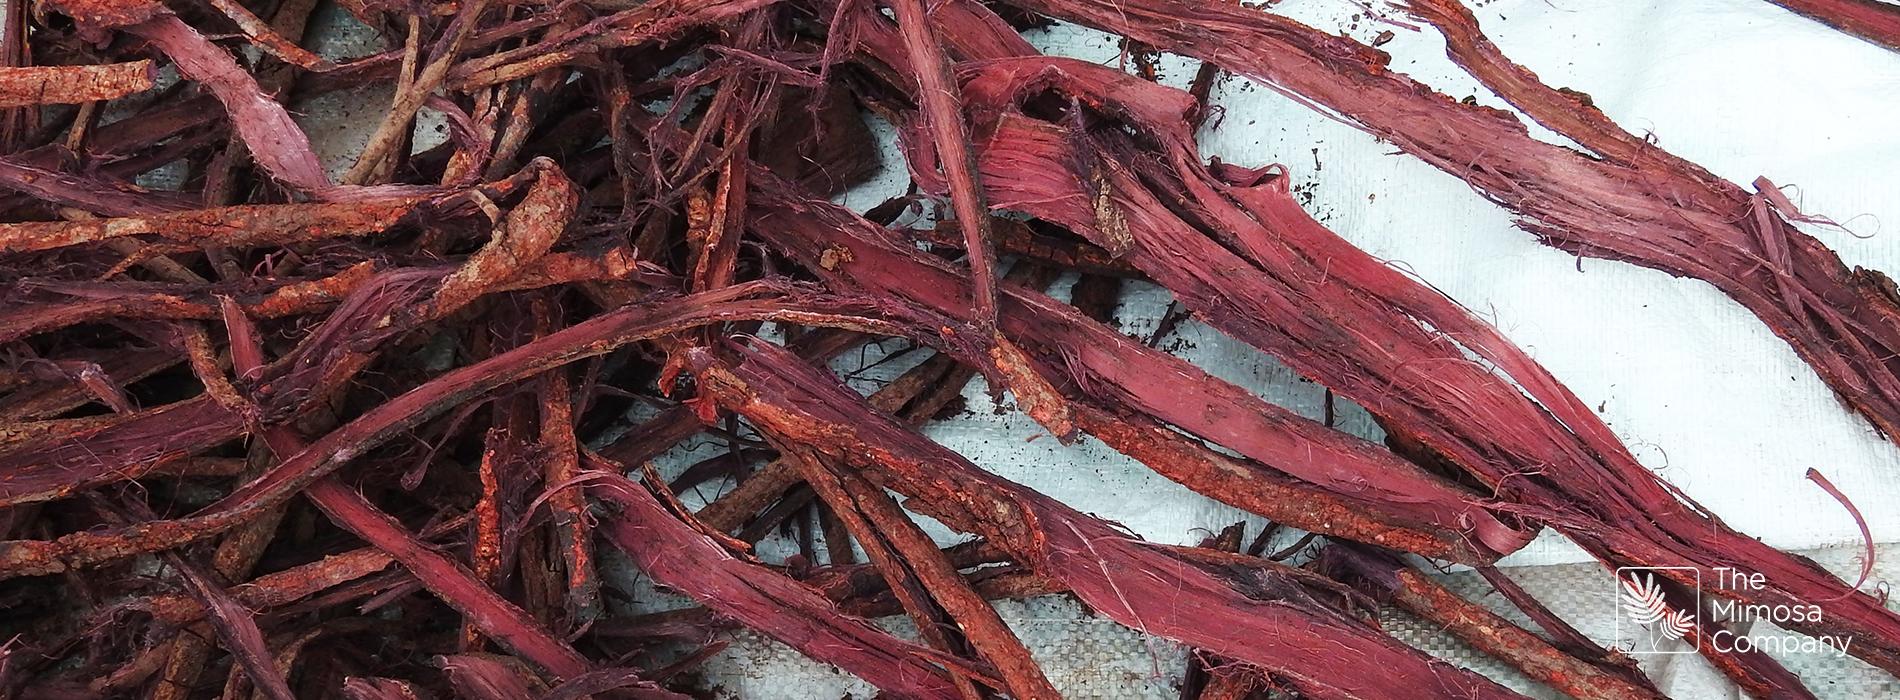 Mimosa hostilis: a vegetable-based alternative for tanning leather